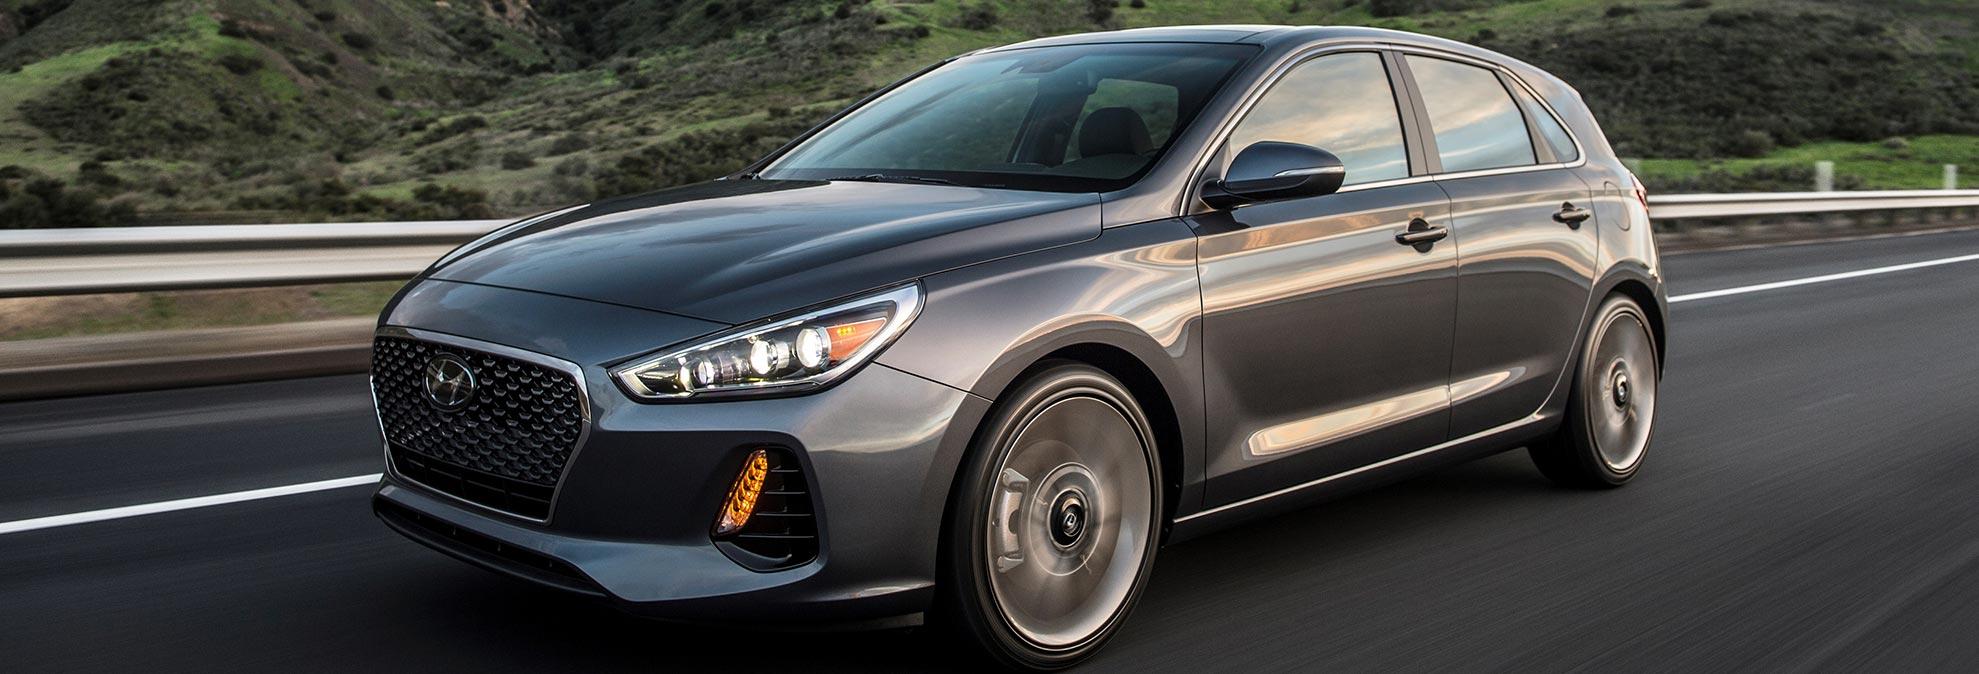 Preview 2018 Hyundai Elantra Gt Consumer Reports